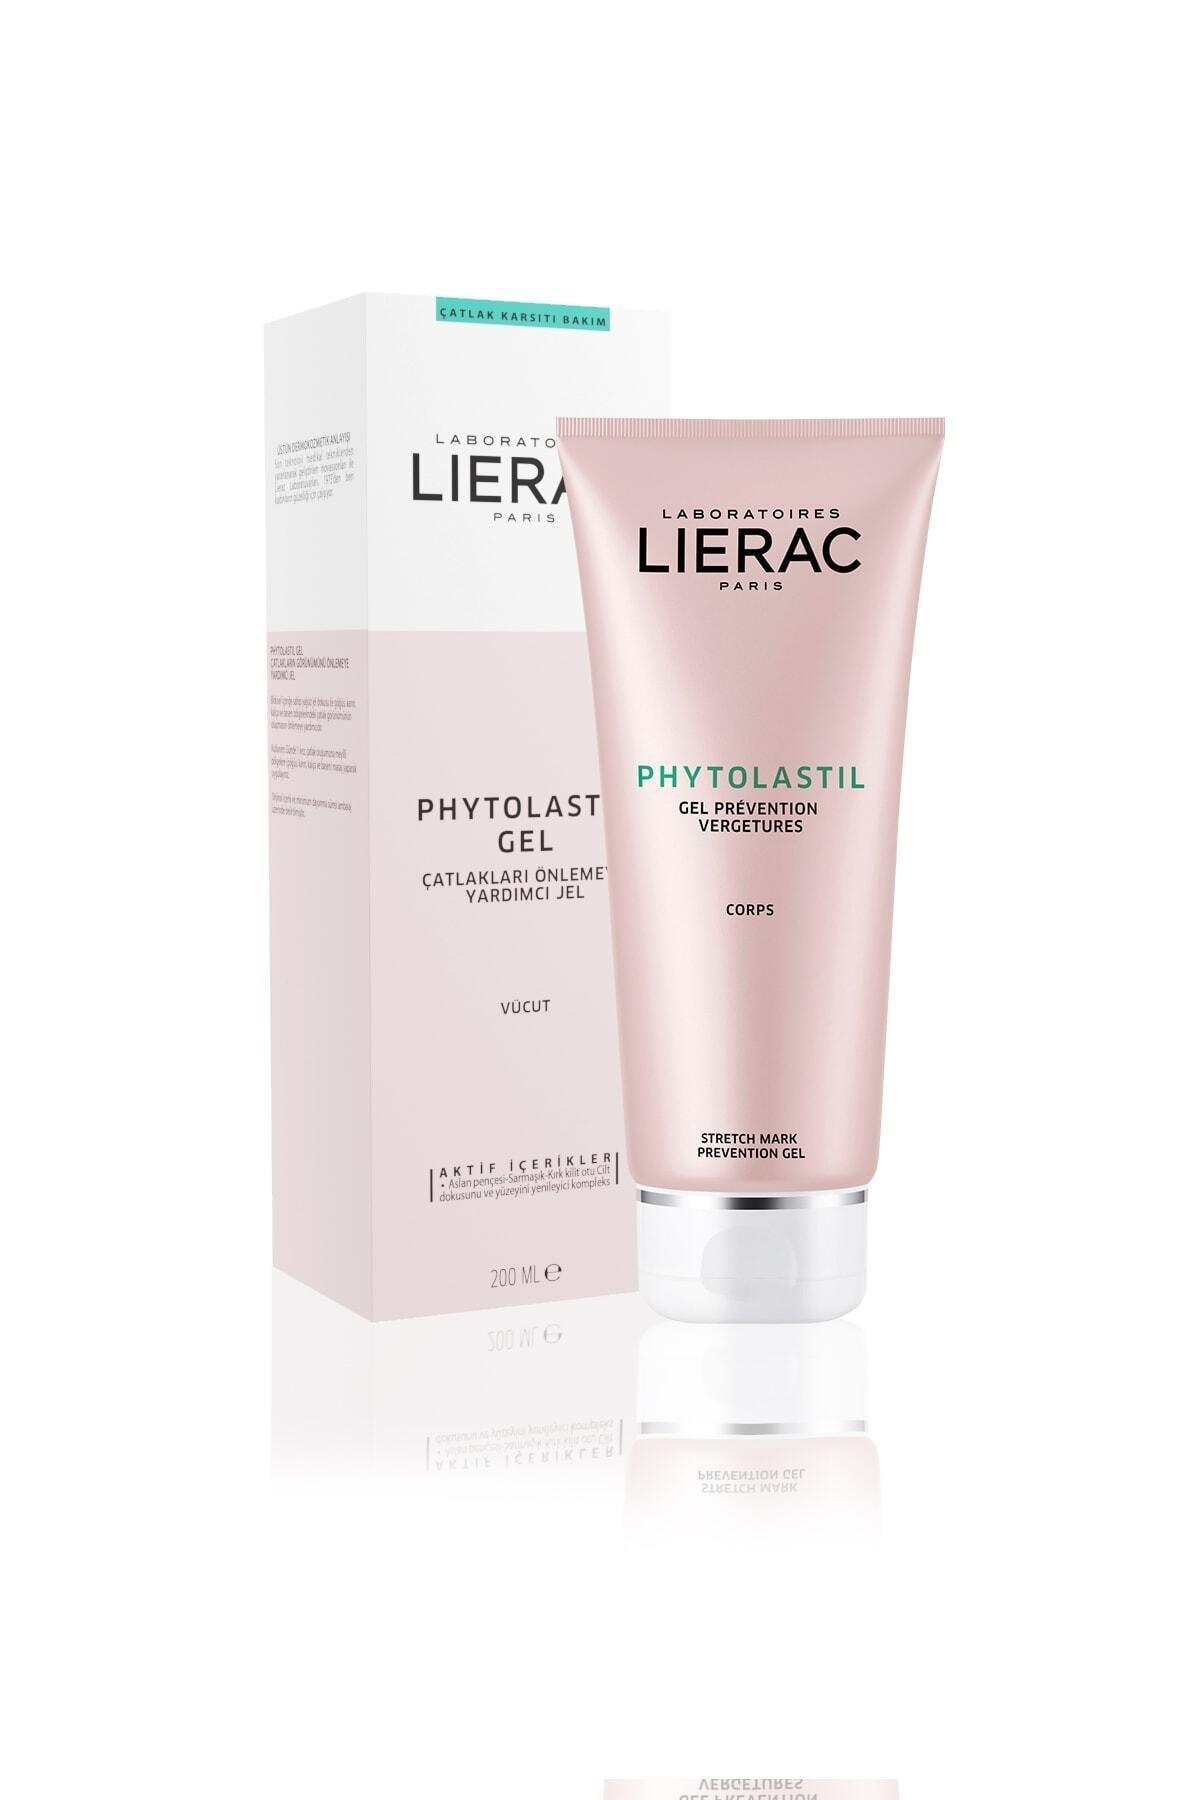 Lierac Phytolastil Jel 200 ml. - 1